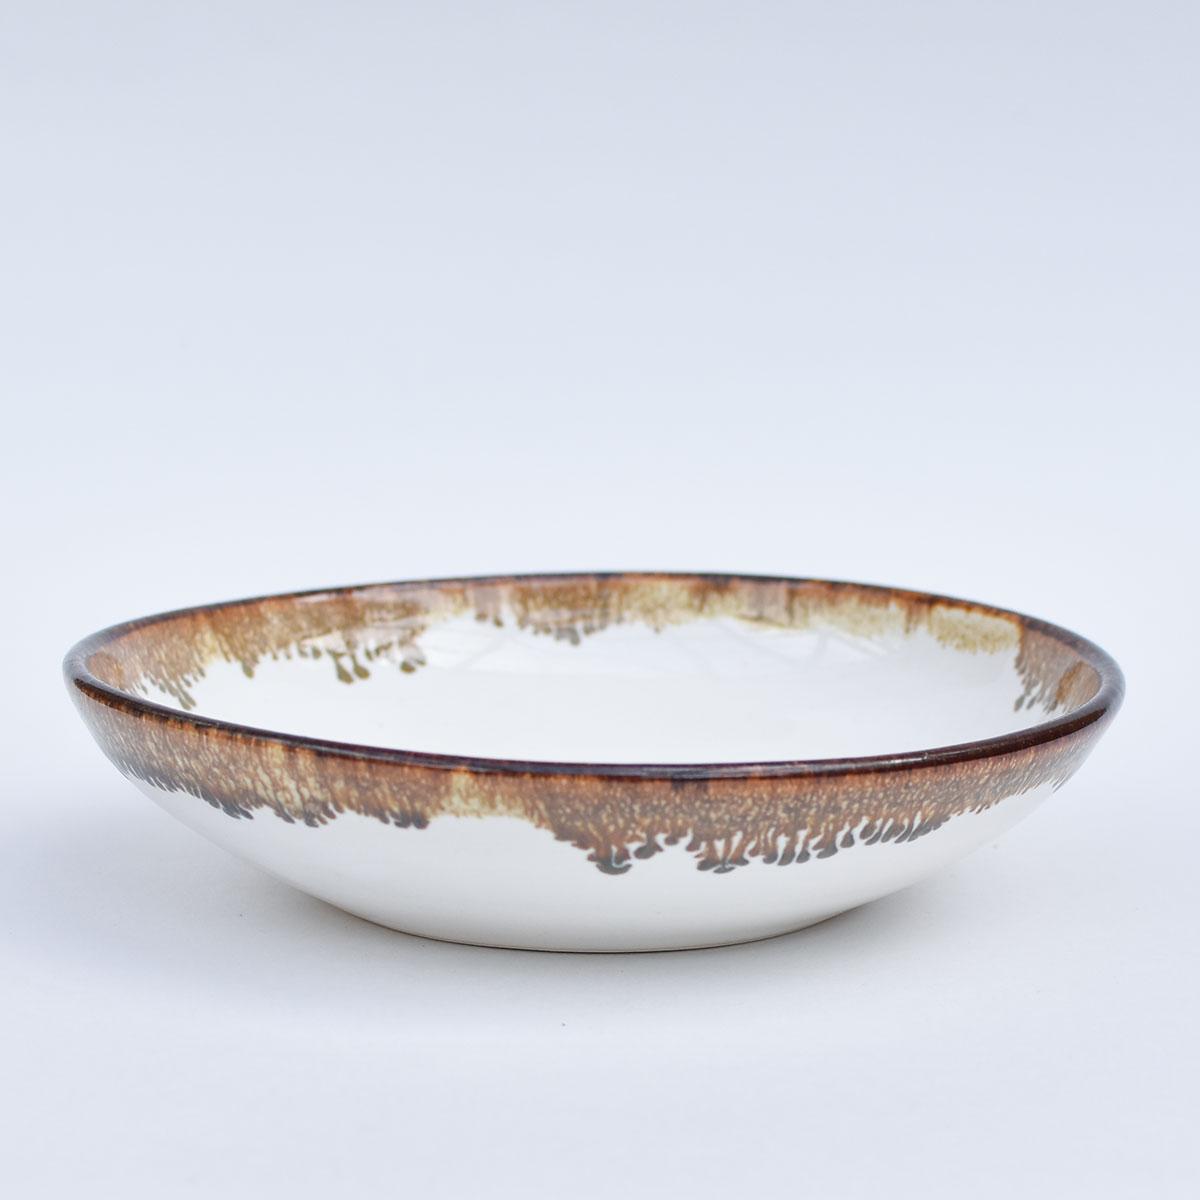 "картинка Керамическая тарелка из серии ""Маршмеллоу"" 18 см - DishWishes.Ru"